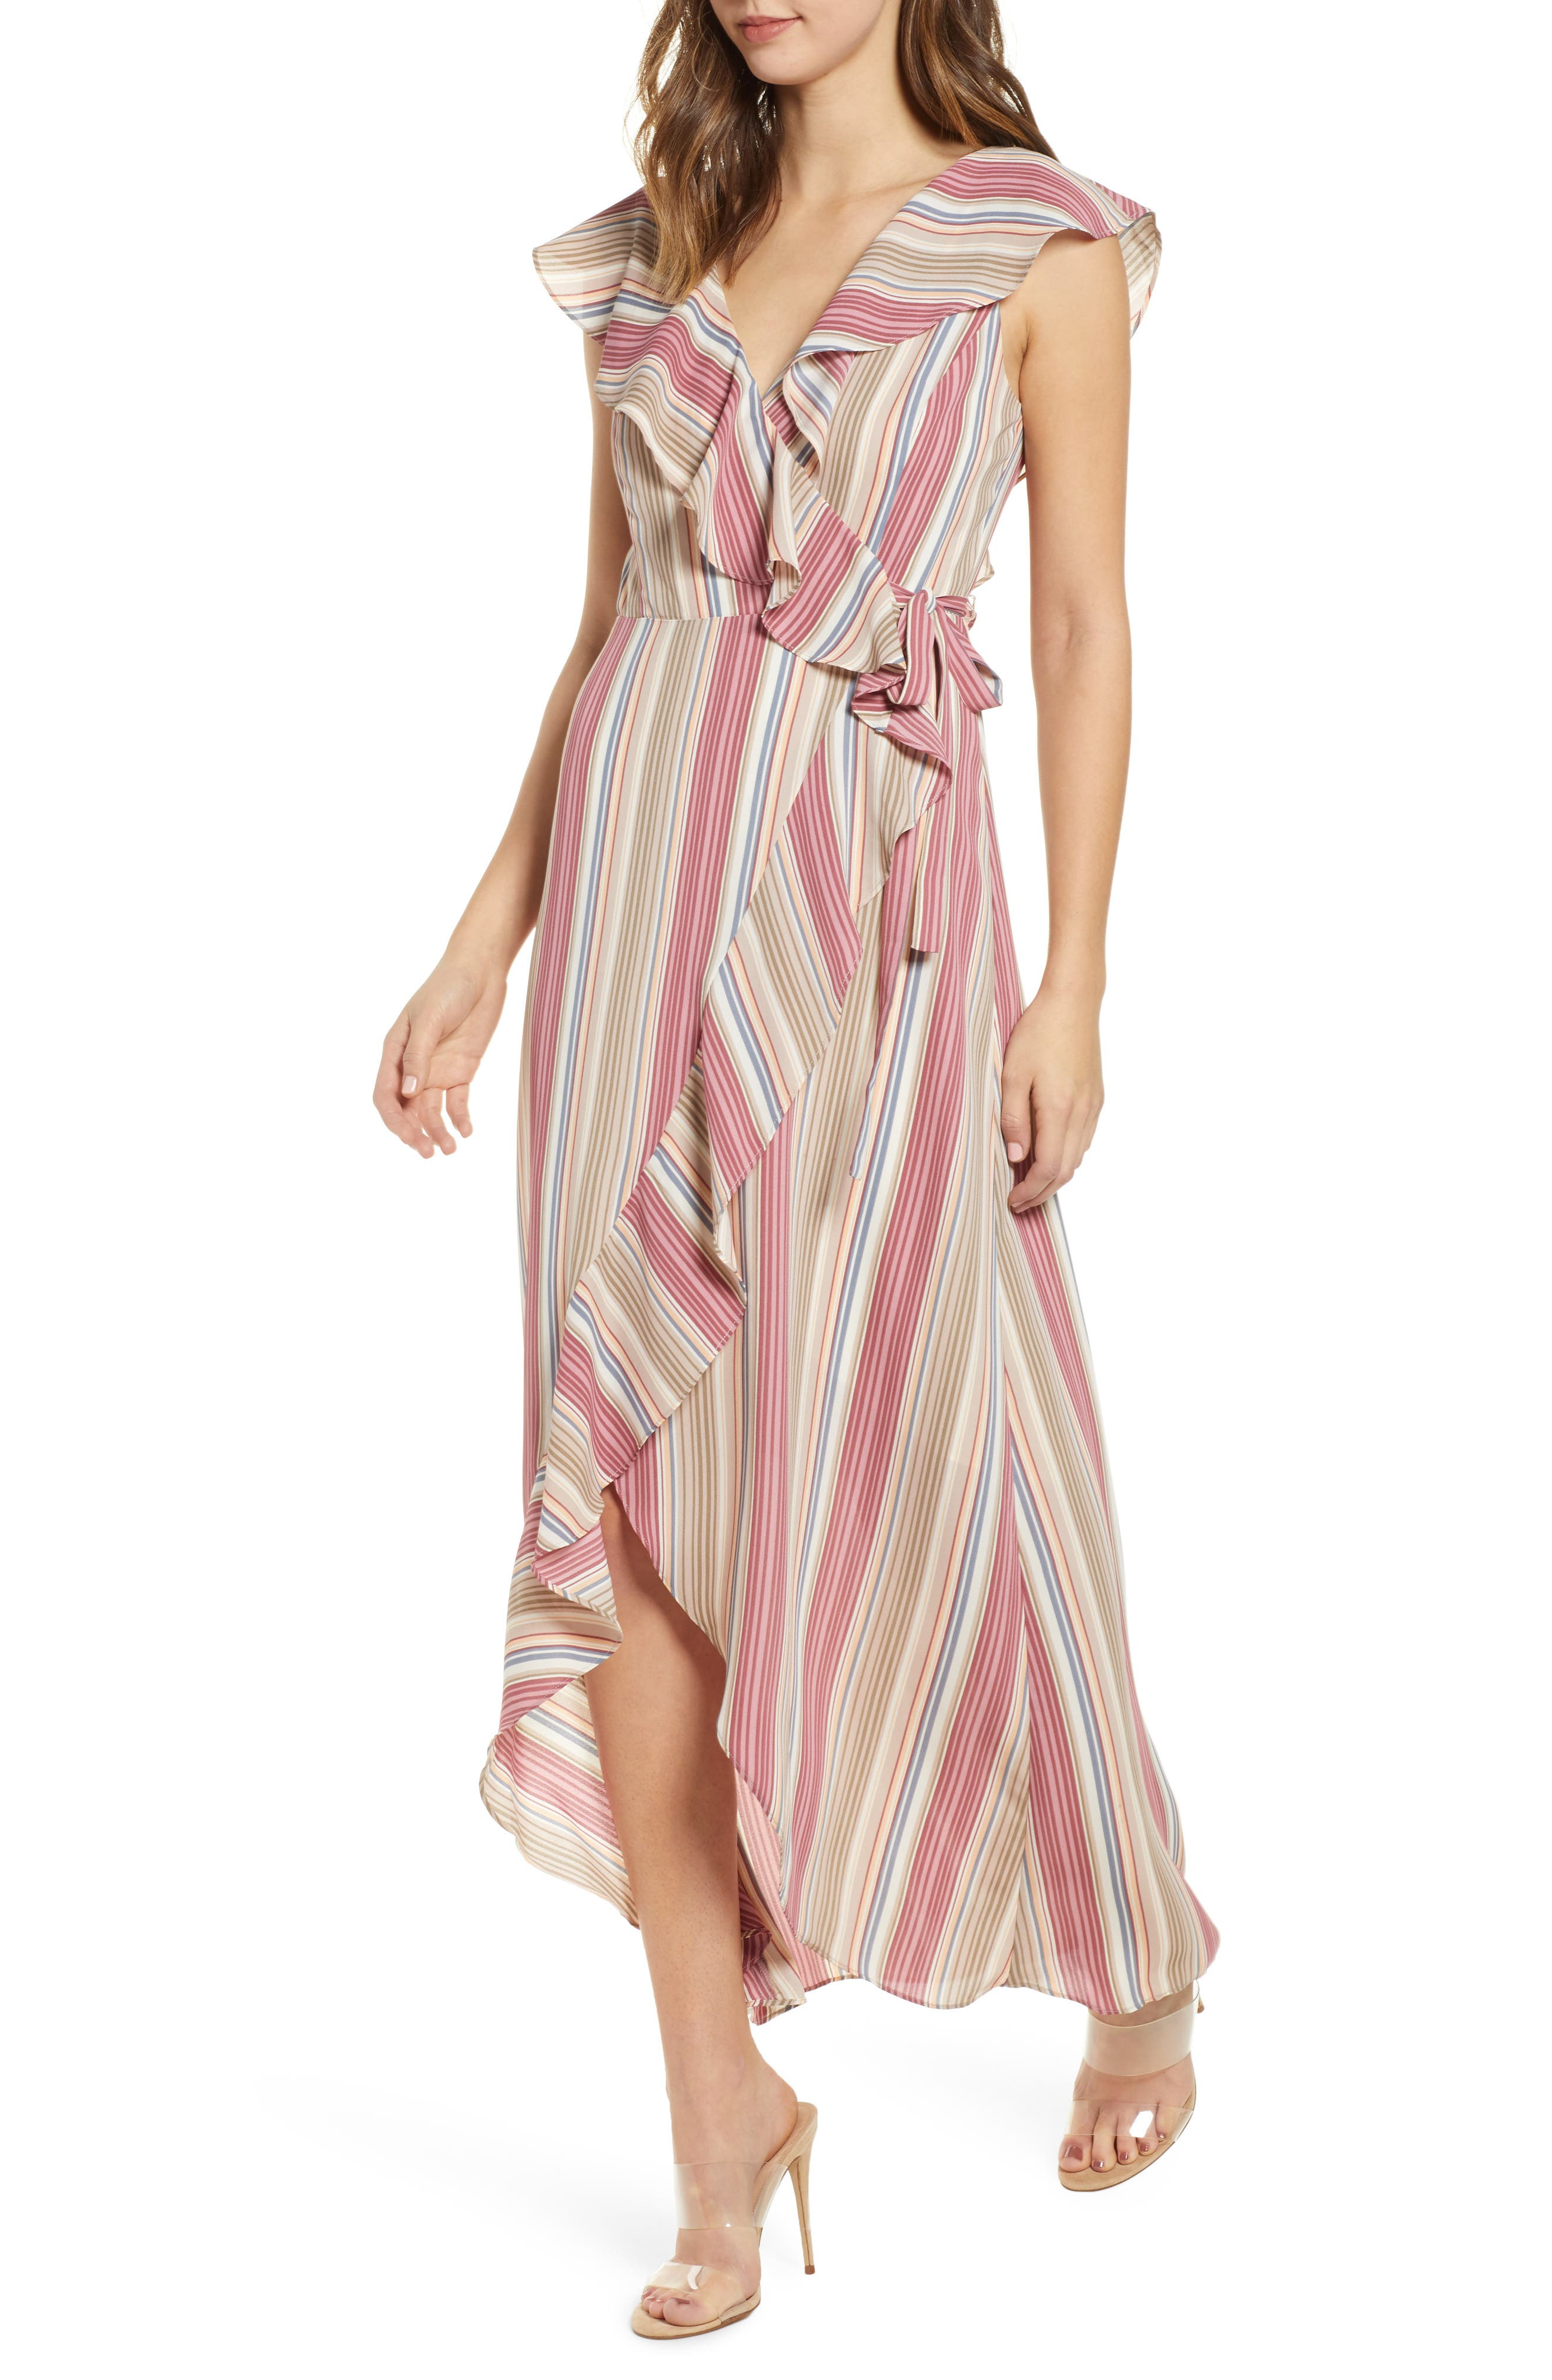 LEITH, Ruffle Wrap Maxi Dress, Main thumbnail 1, color, PINK CANYON TONAL STRIPE